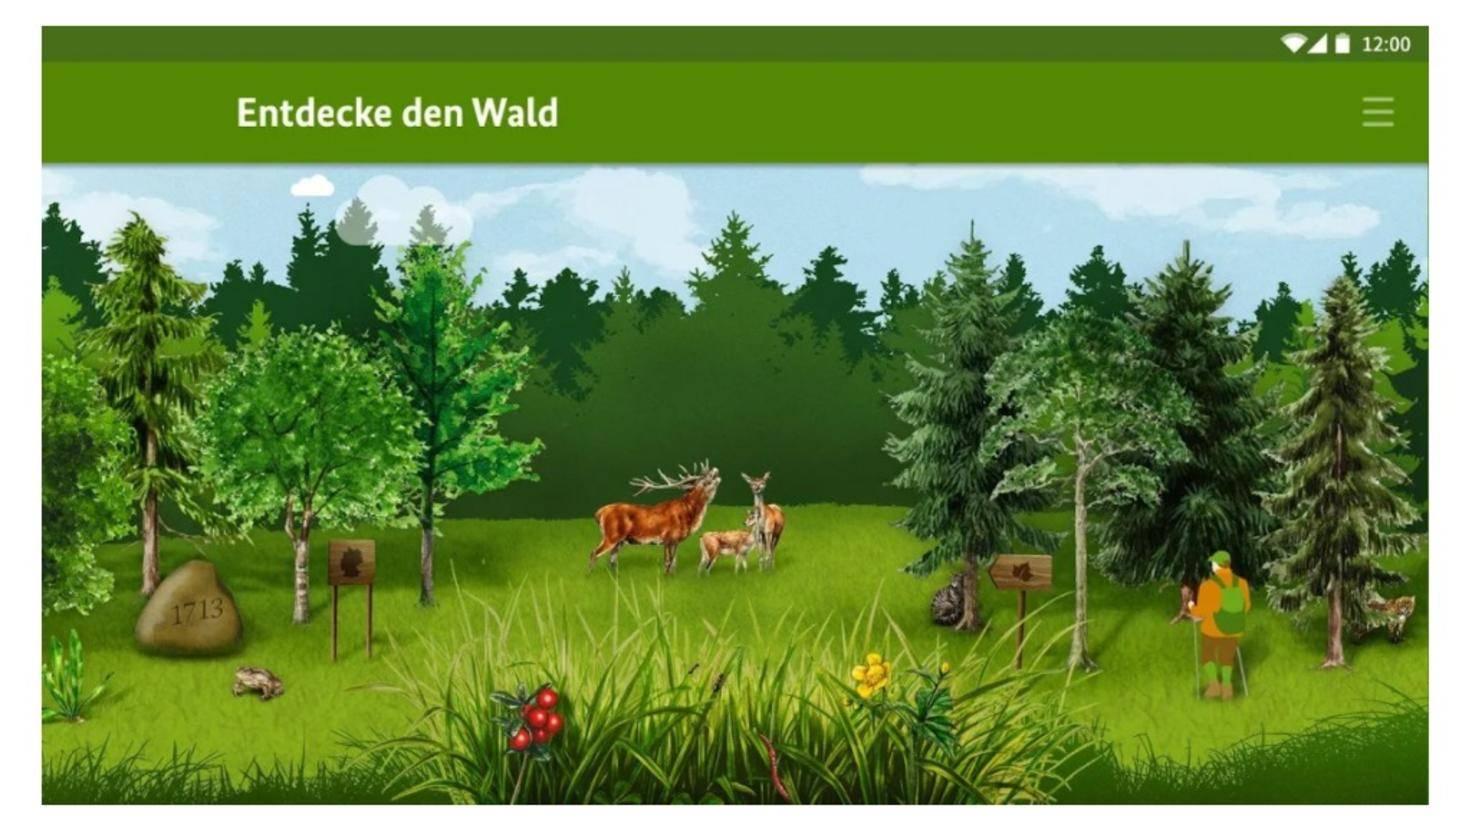 waldfibel-app